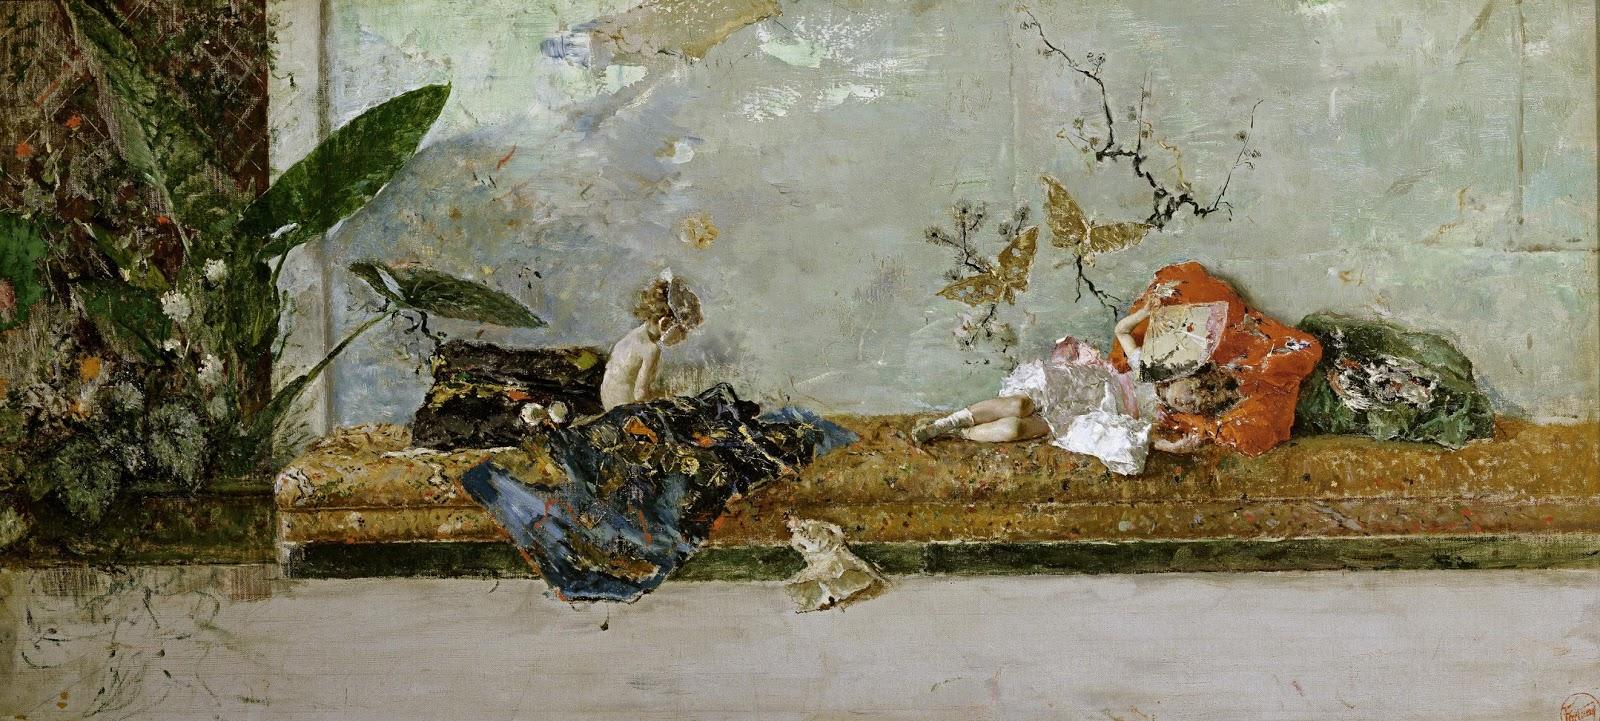 MARIANO FORTUNY Y MARSAL - Filhos do artista num jardim japonês - Óleo sobre tela - 44 x 93 - 1874.jpg